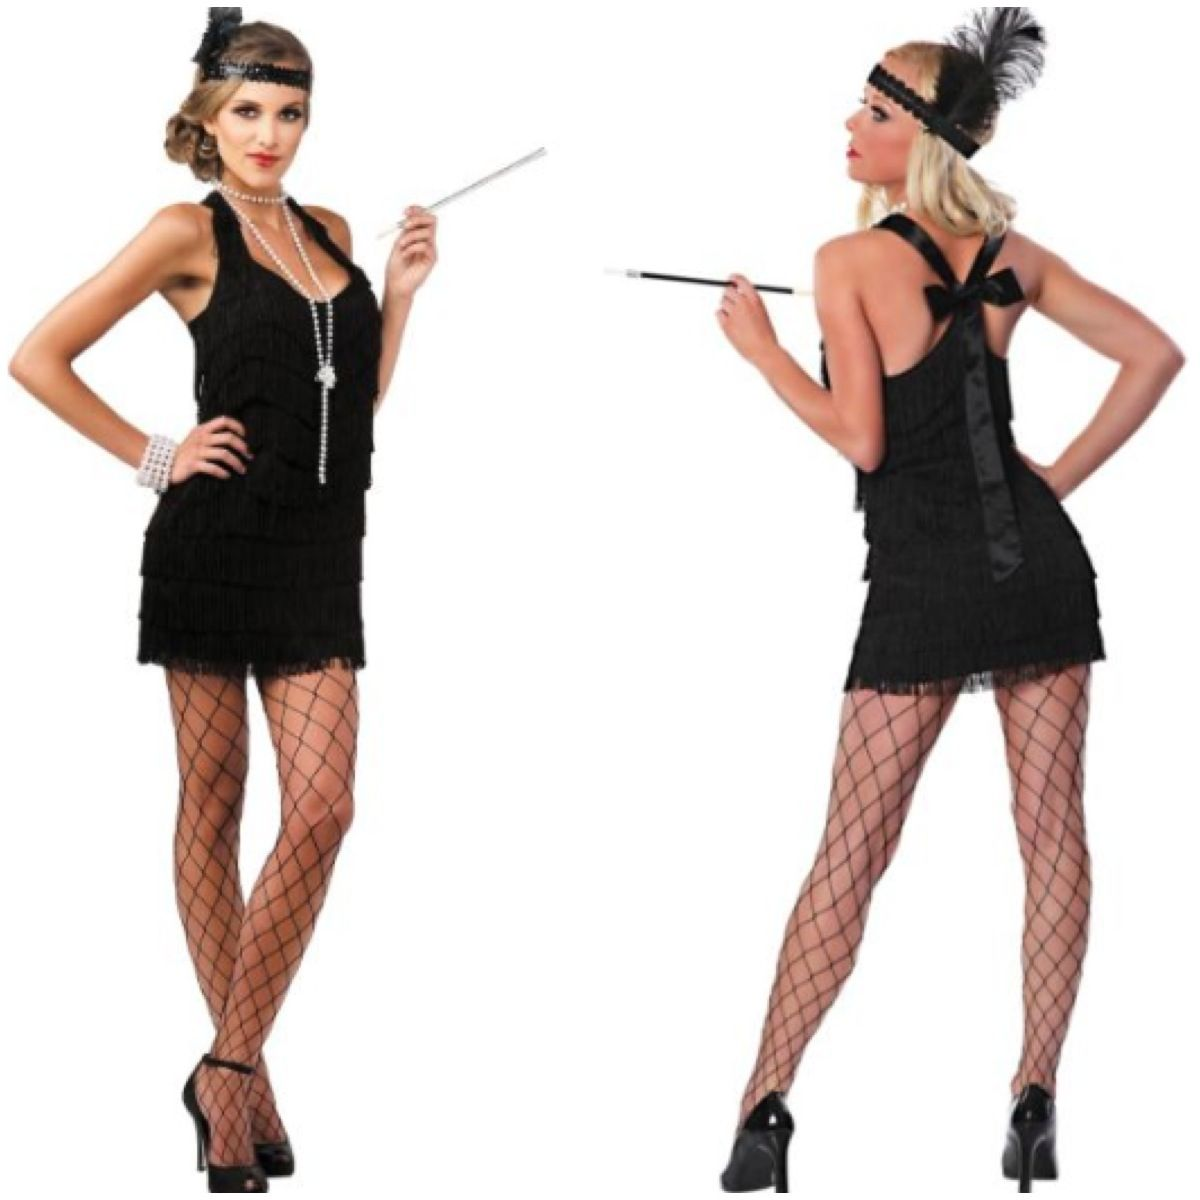 Flapper 20's costume party city | Costumes ideas | Pinterest ...